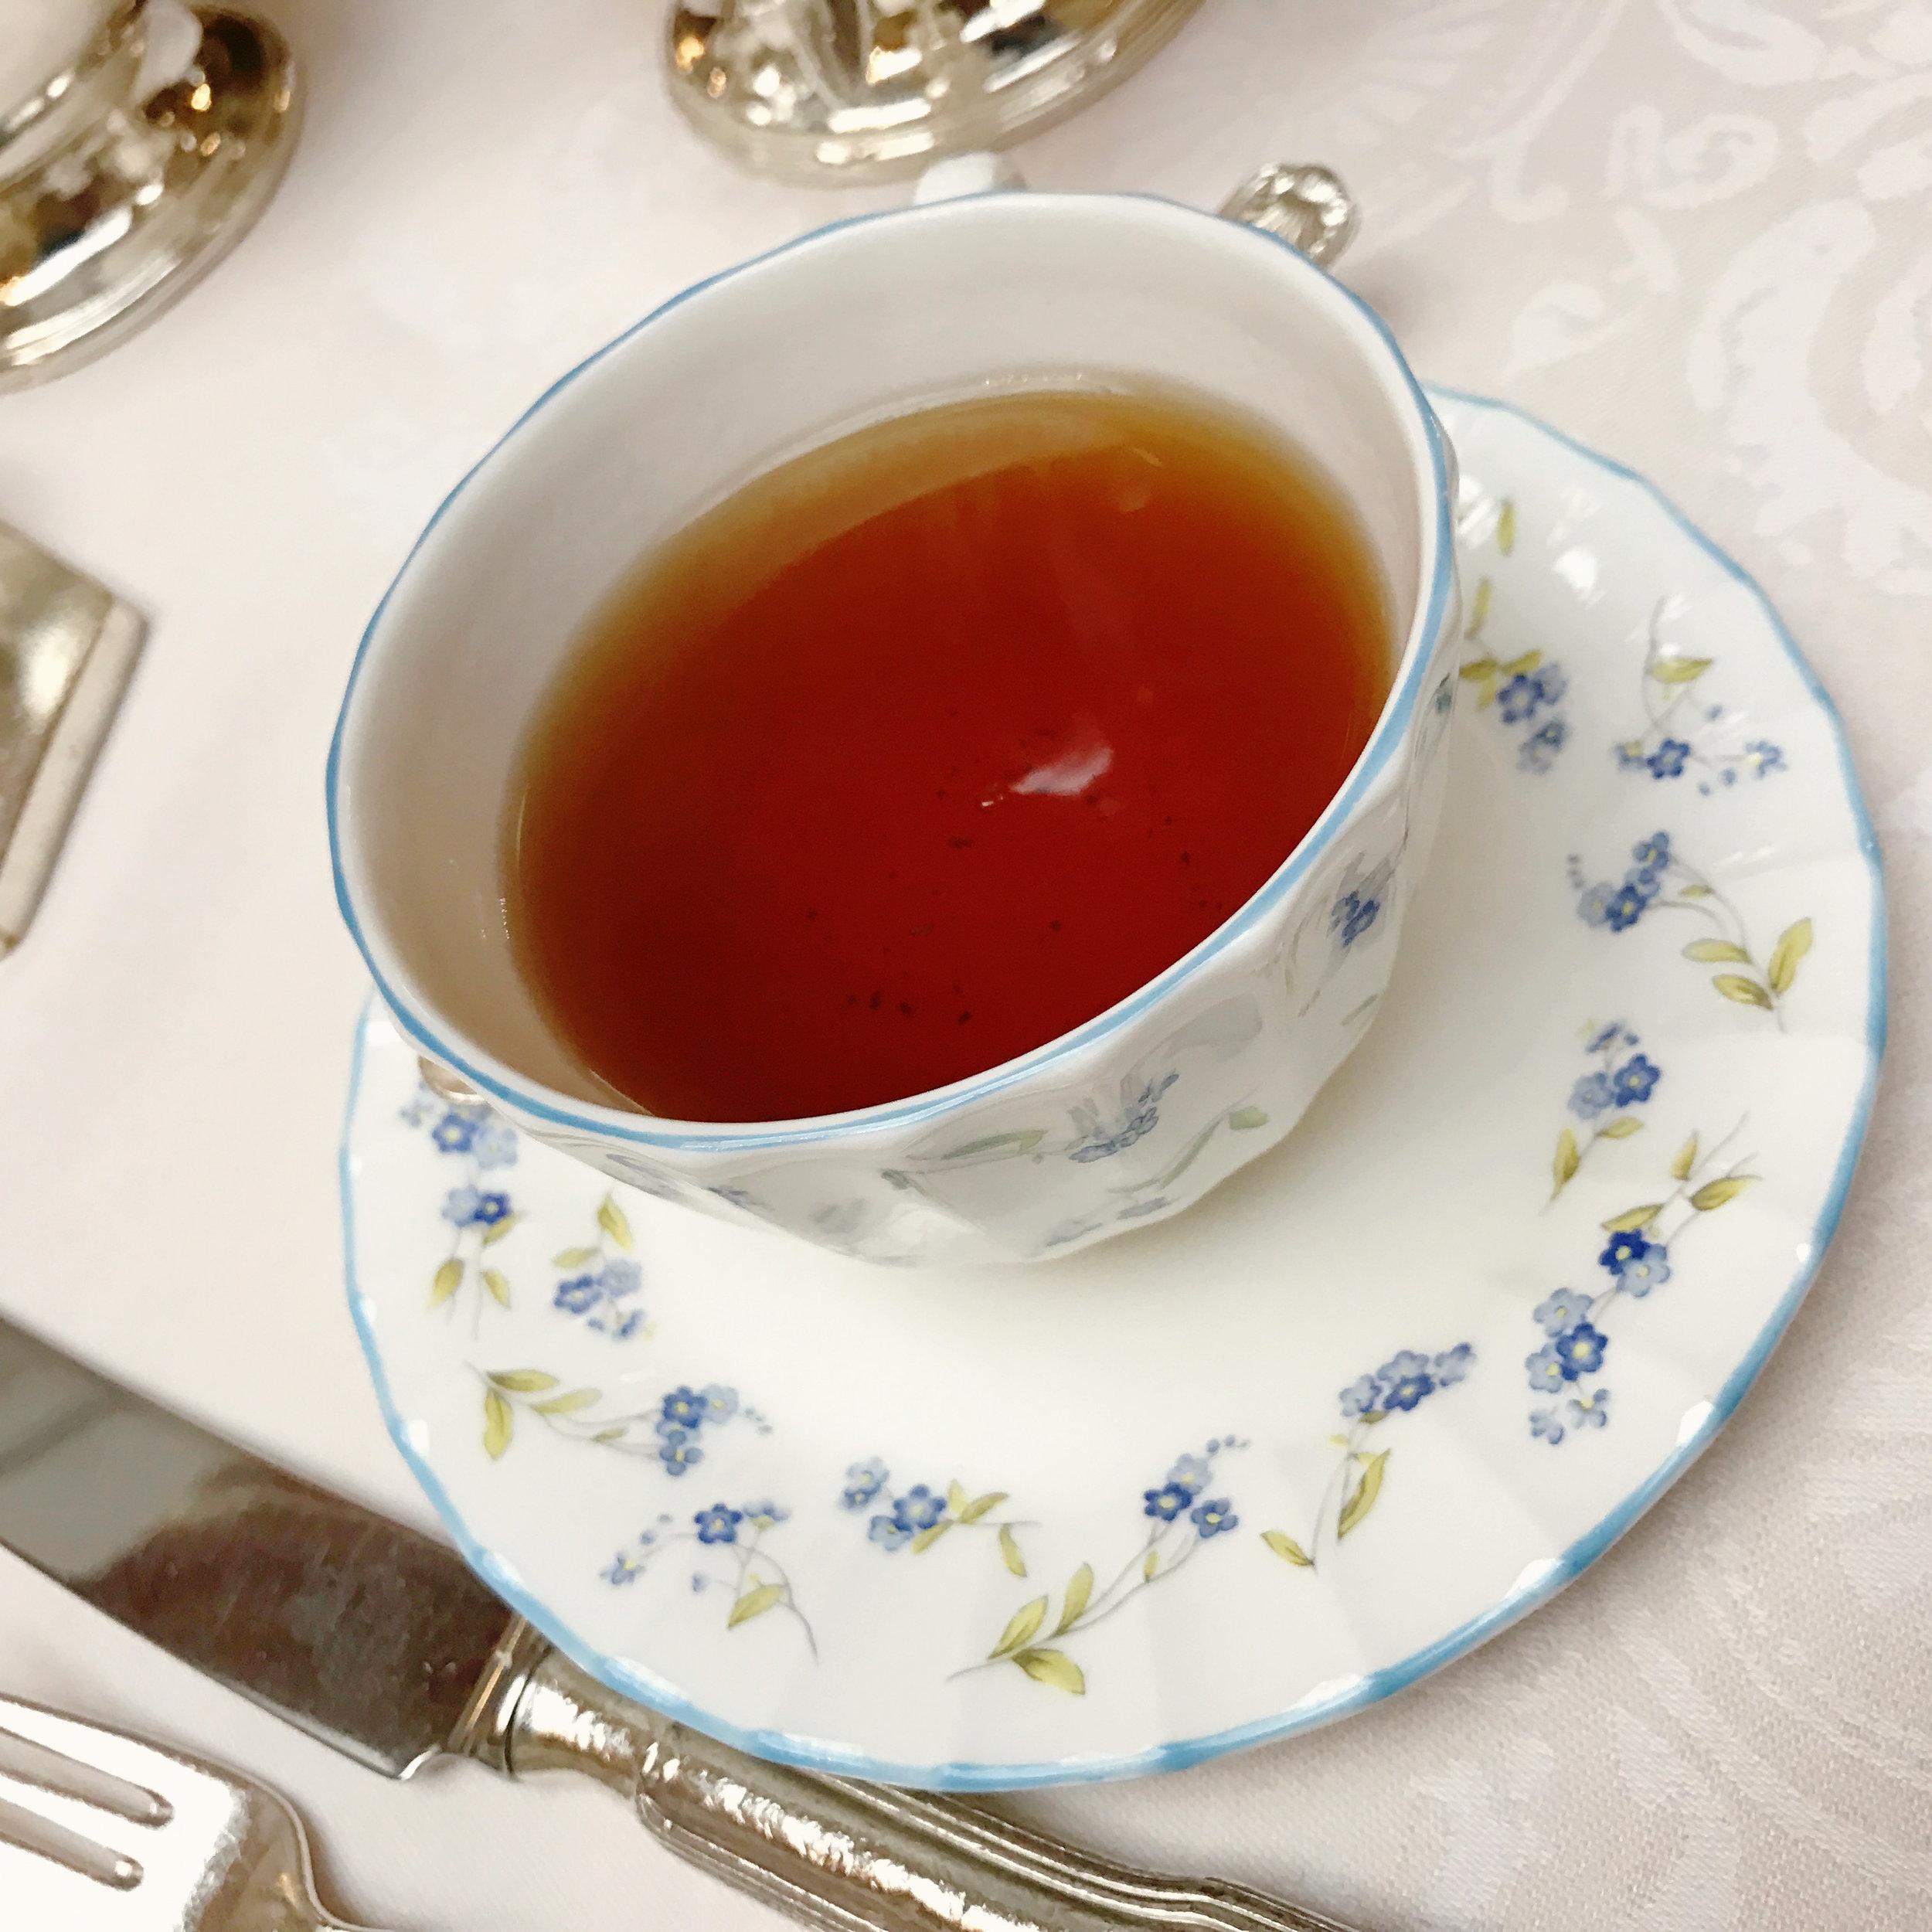 Tea at The Ritz London - #Kurtantravels London Travel Guide Part 2 - BySarahRae.com